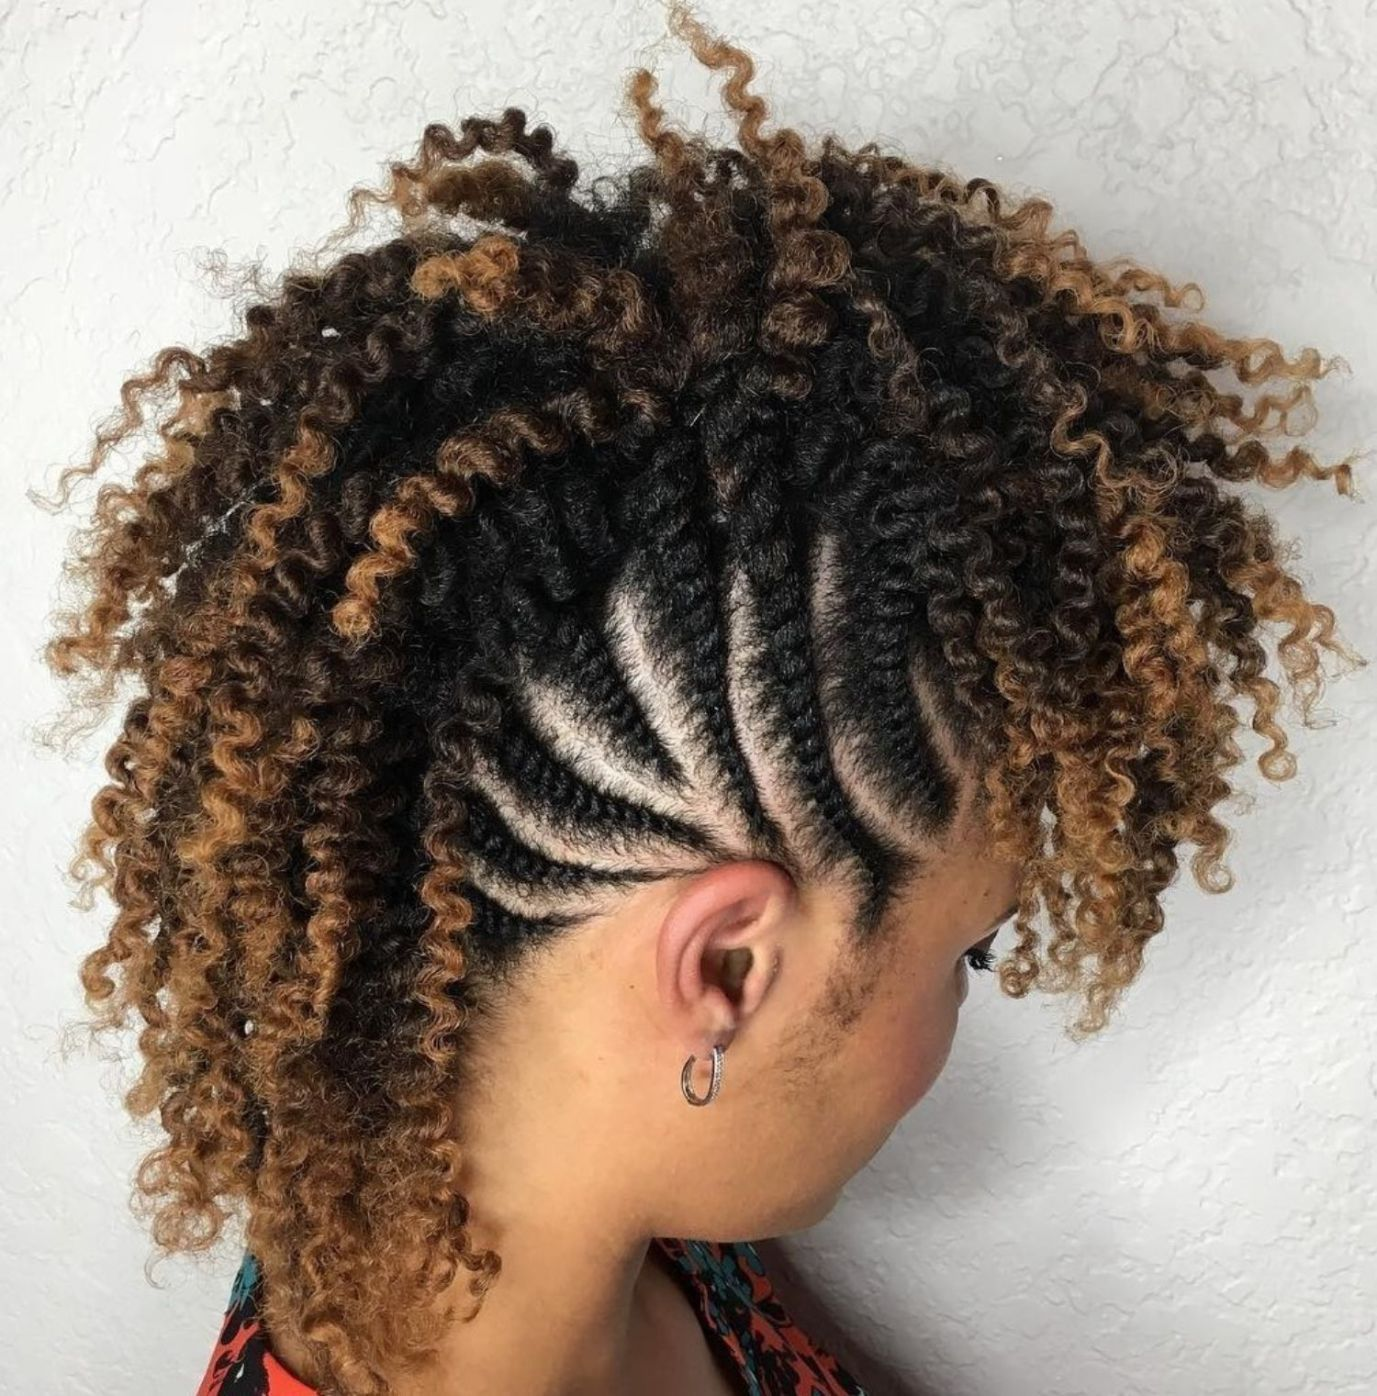 Best Black Braided Hairstyles That Turn Heads Wanda likes